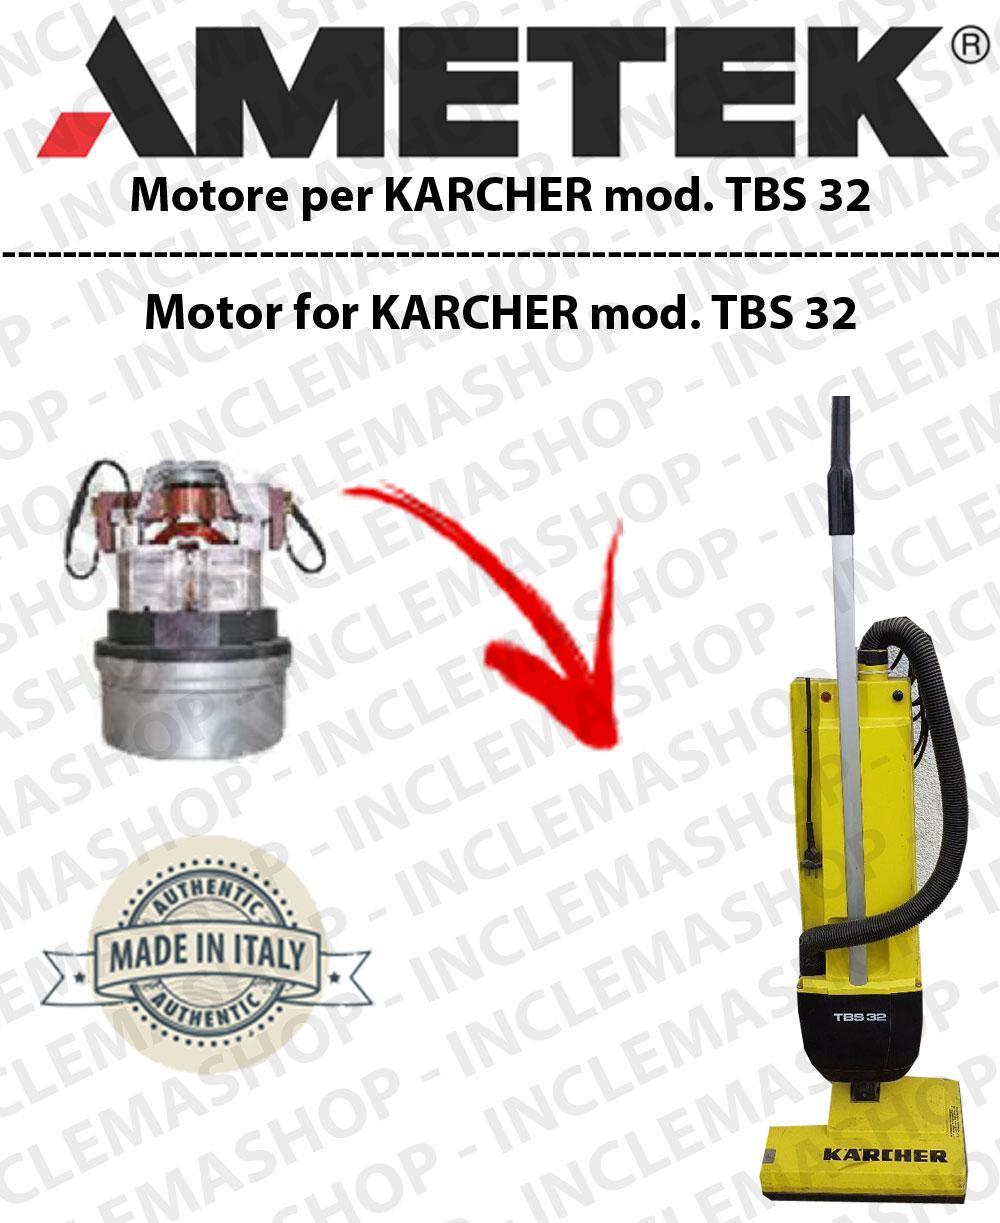 TBS 32 Saugmotor AMETEK für Klopfsauger KARCHER